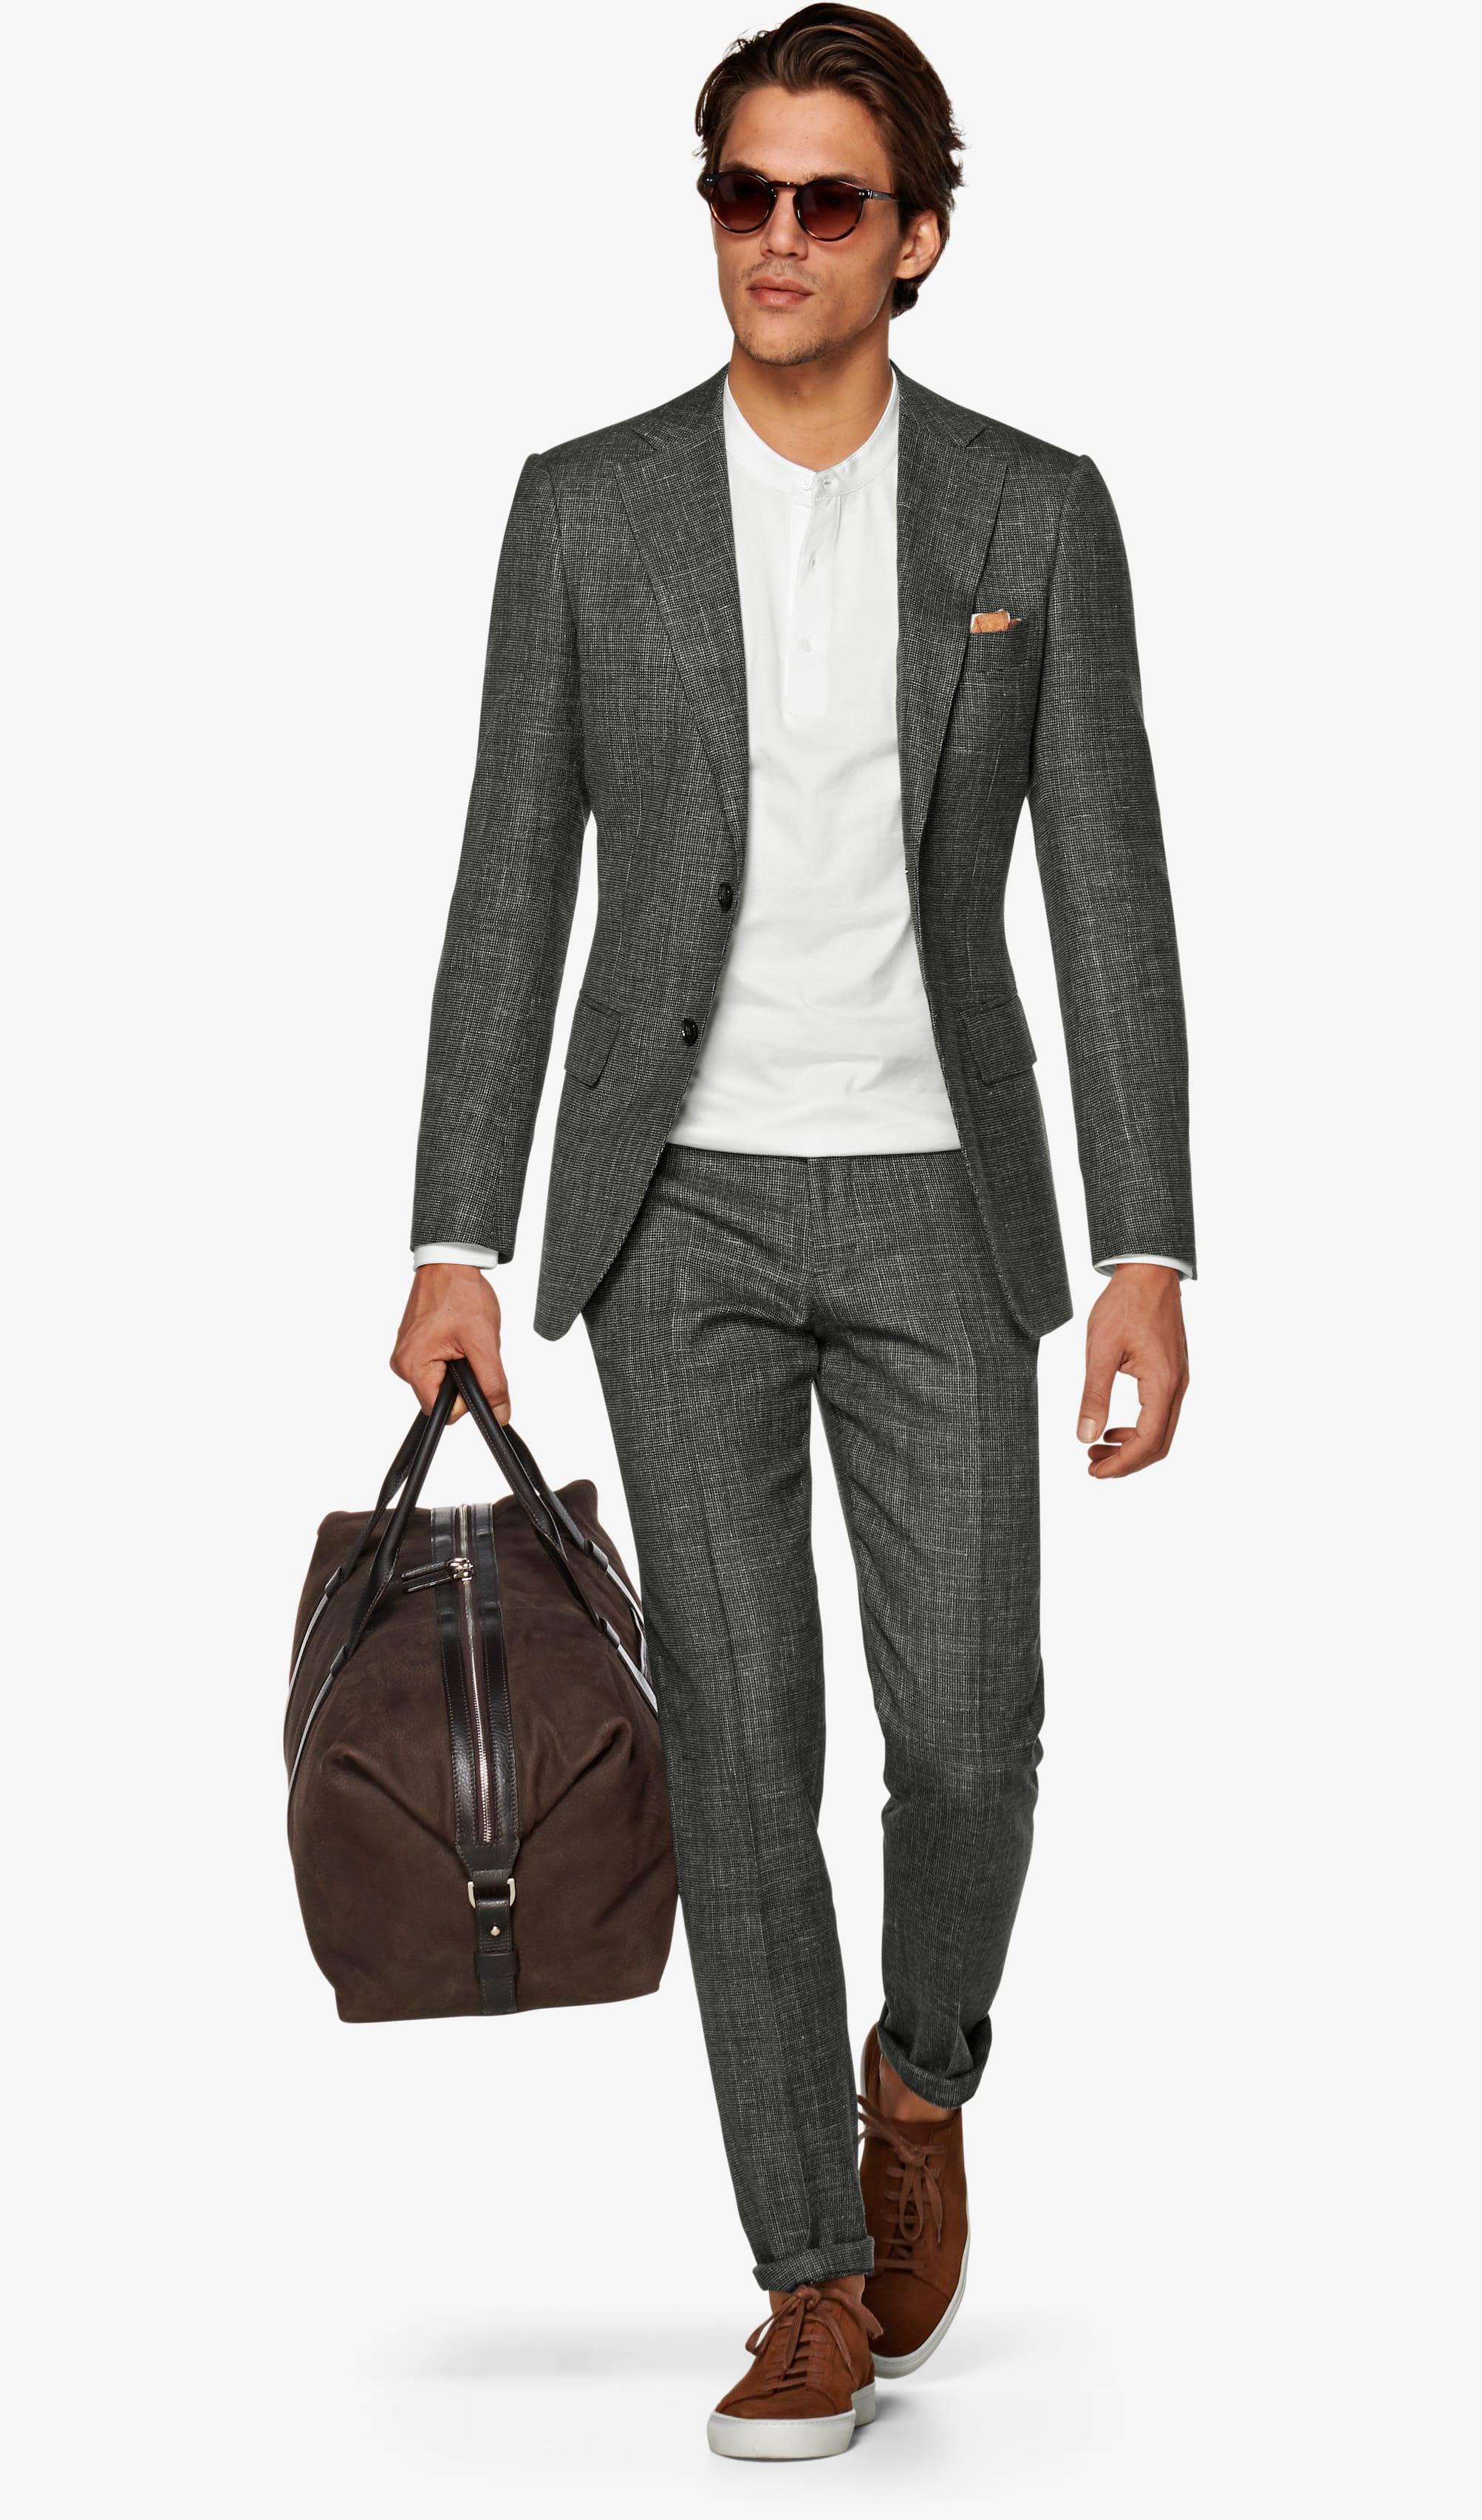 Suit_Green_Plain_Lazio_P5732I